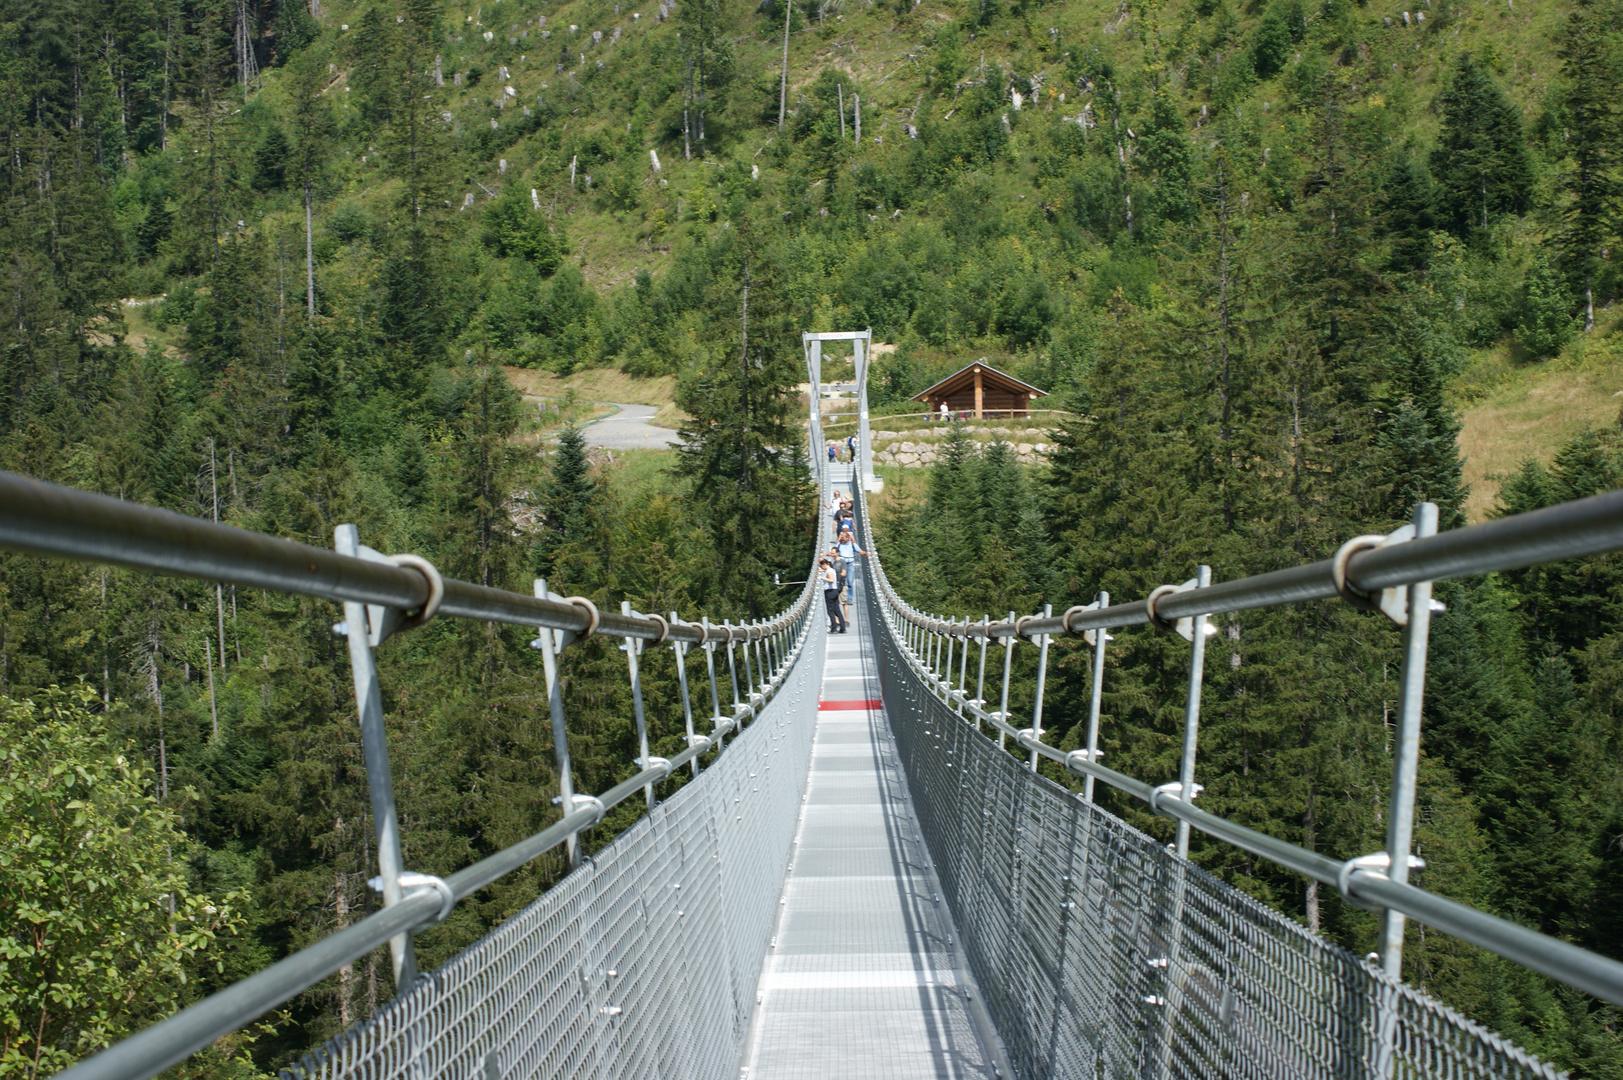 Skywalk Hängebrücke Hochstuckli